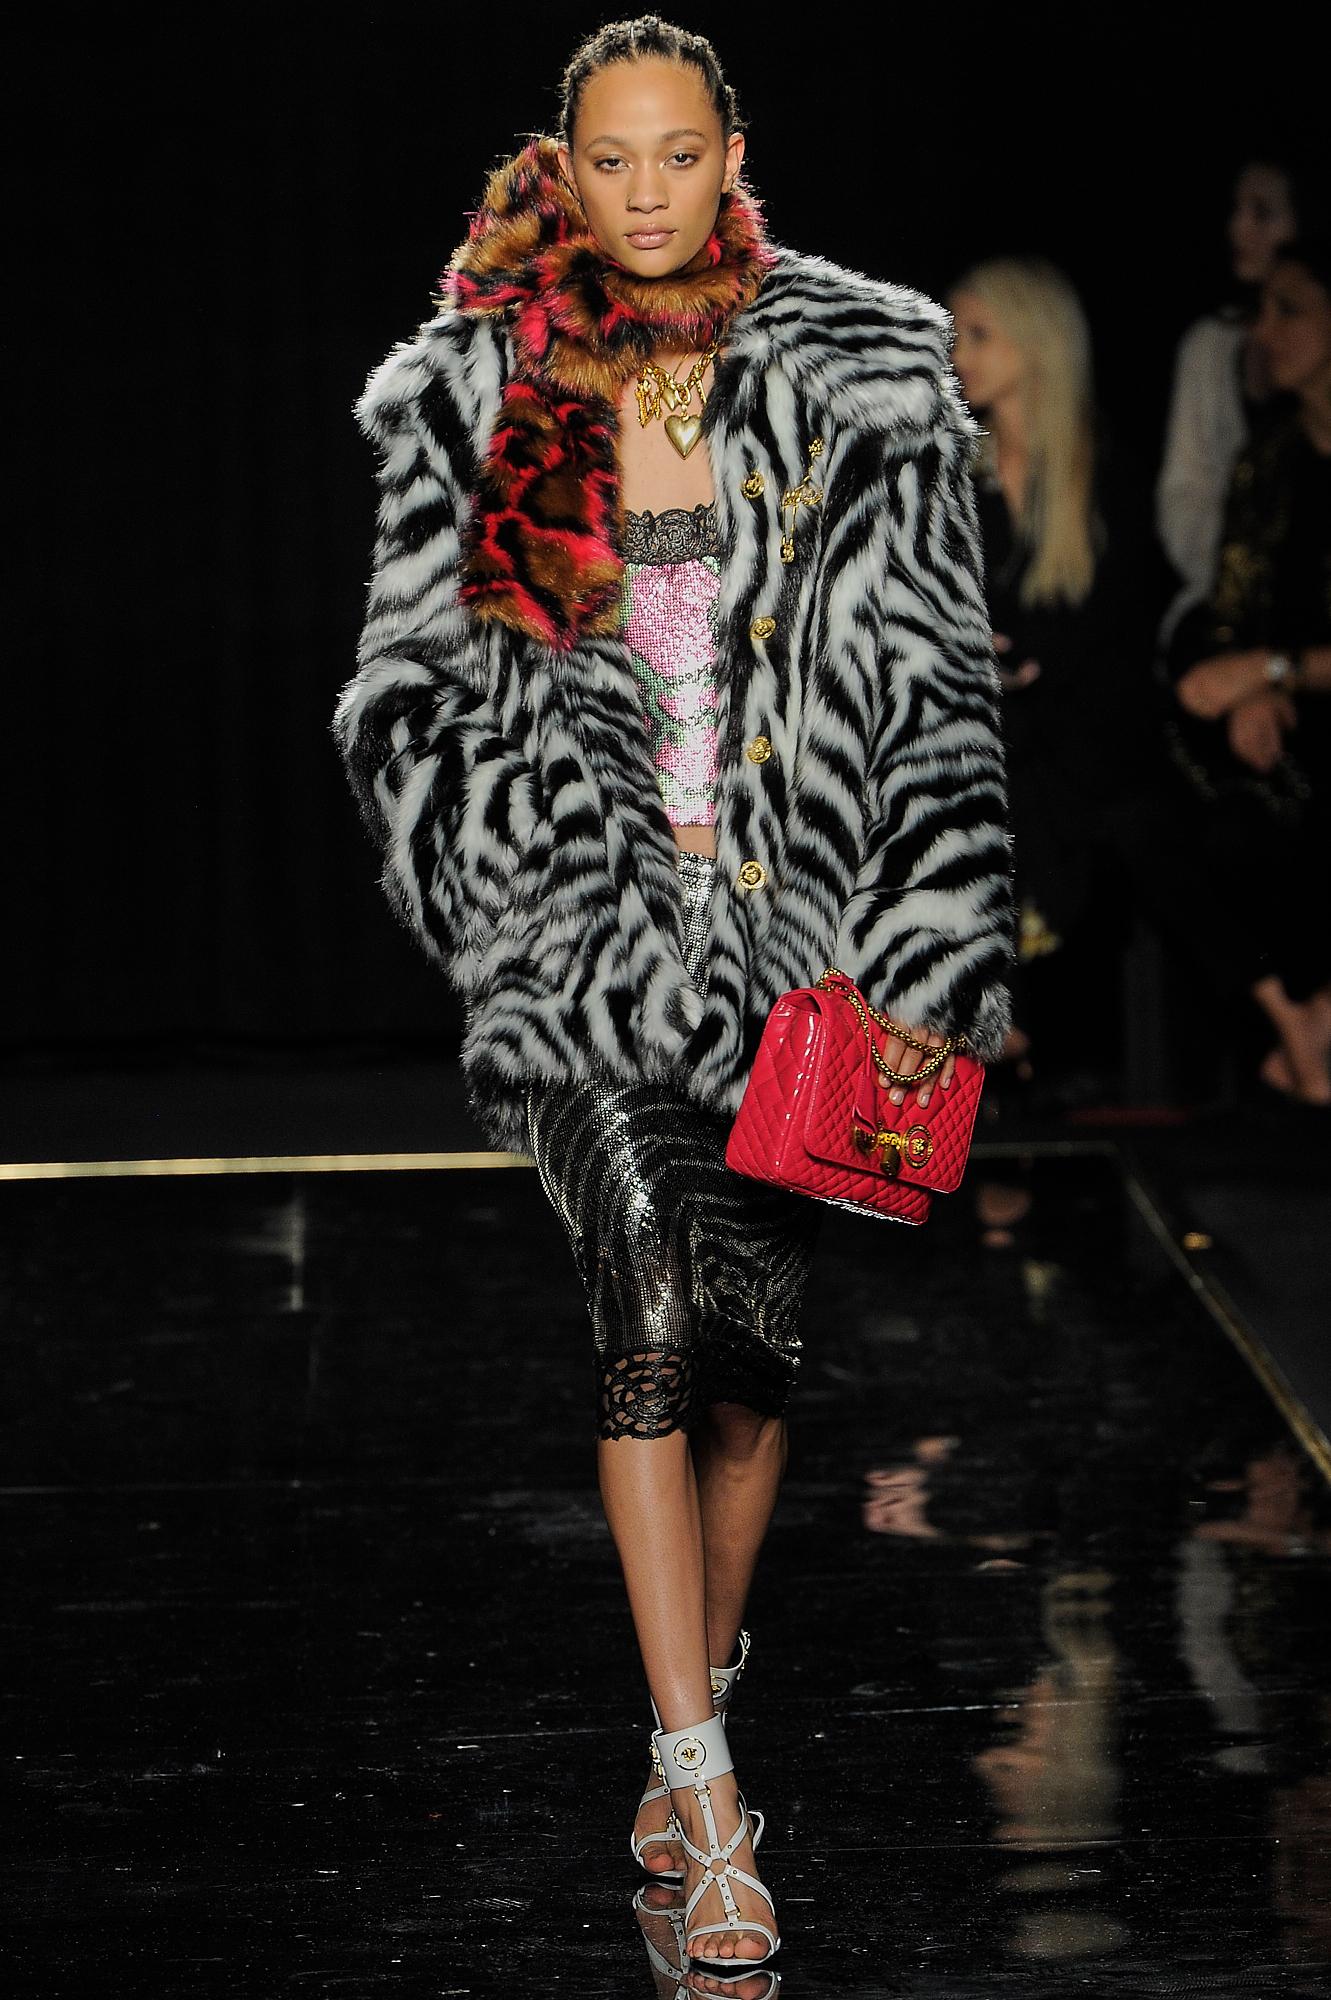 Versace_27_0d_versace_runway_runway_00027.jpg